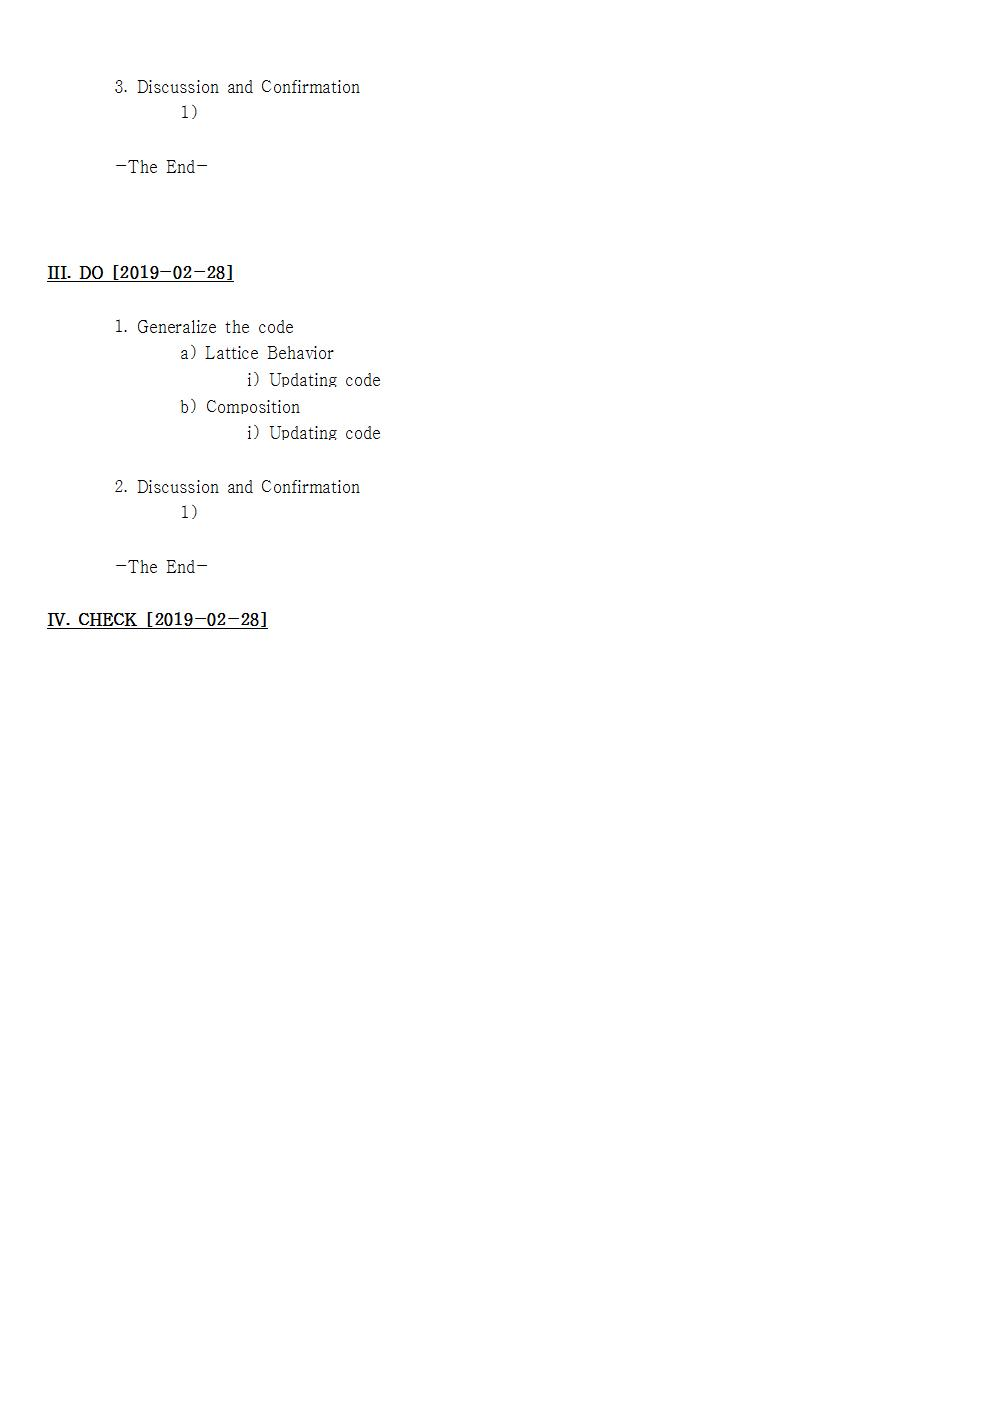 D-[19-002-RD-02]-[PRISM2.0-ADOxx]-[2019-02-28]-[MR]002.jpg